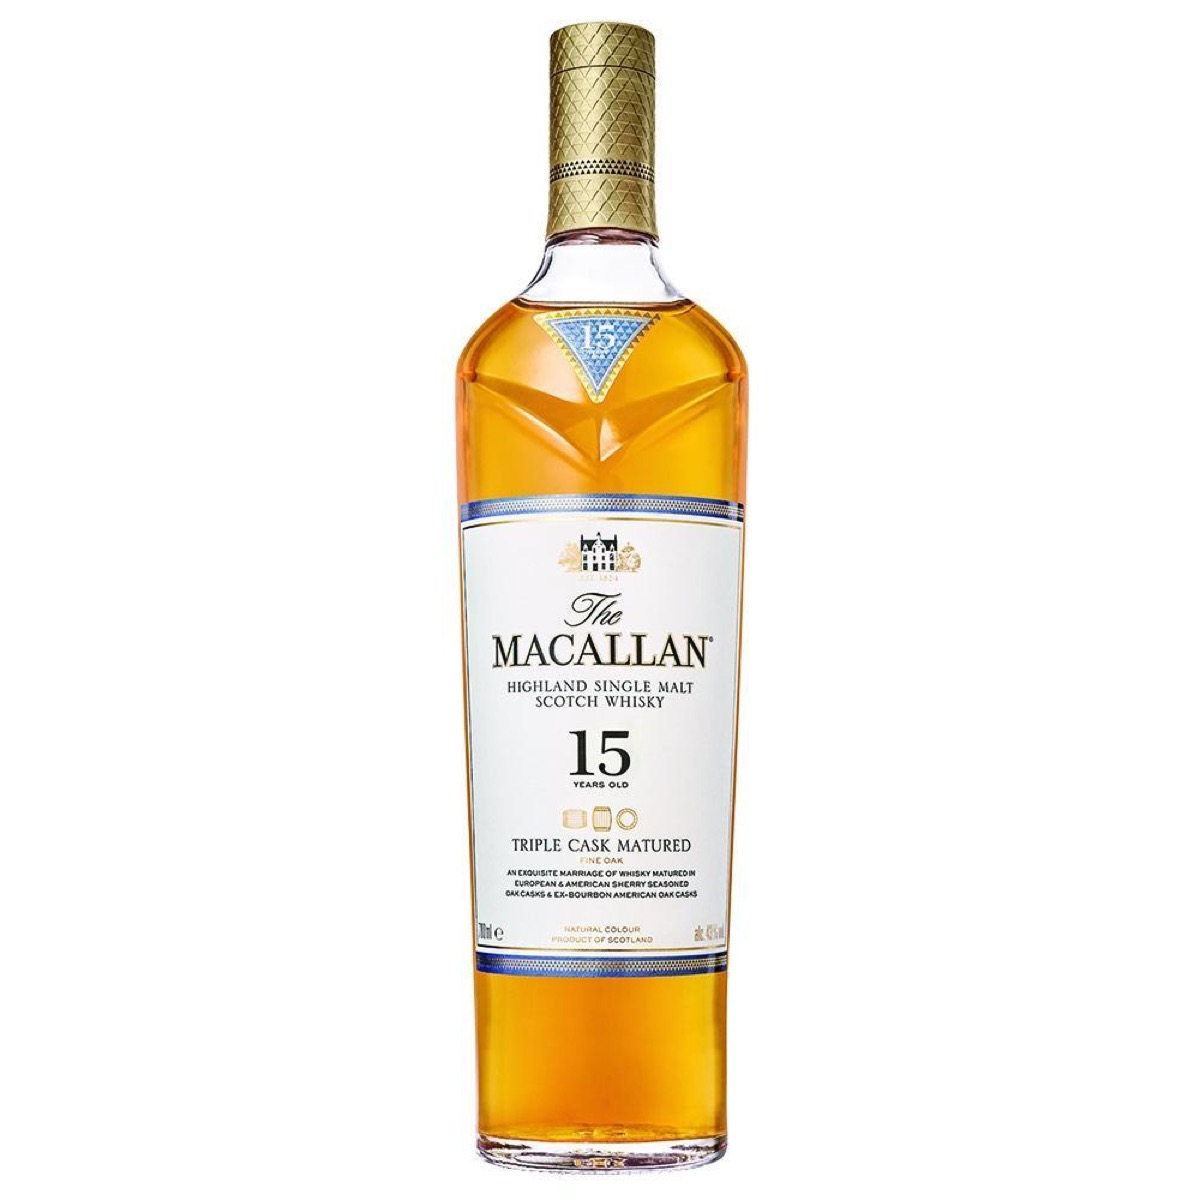 macallan 15-year-old single malt scotch whiskey mash and grape, best boyfriend gifts